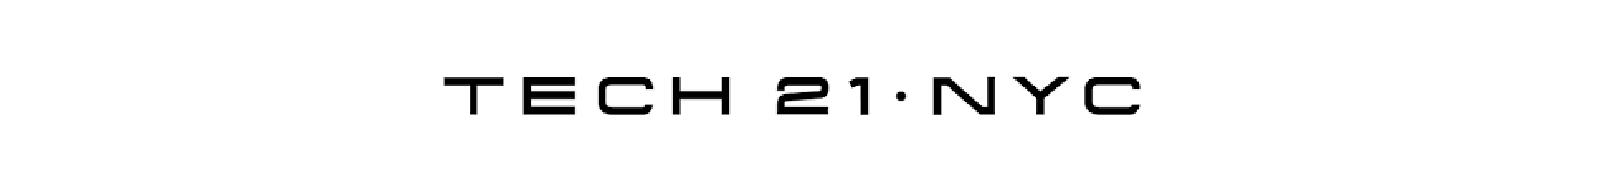 Tech 21 Effects Pedals